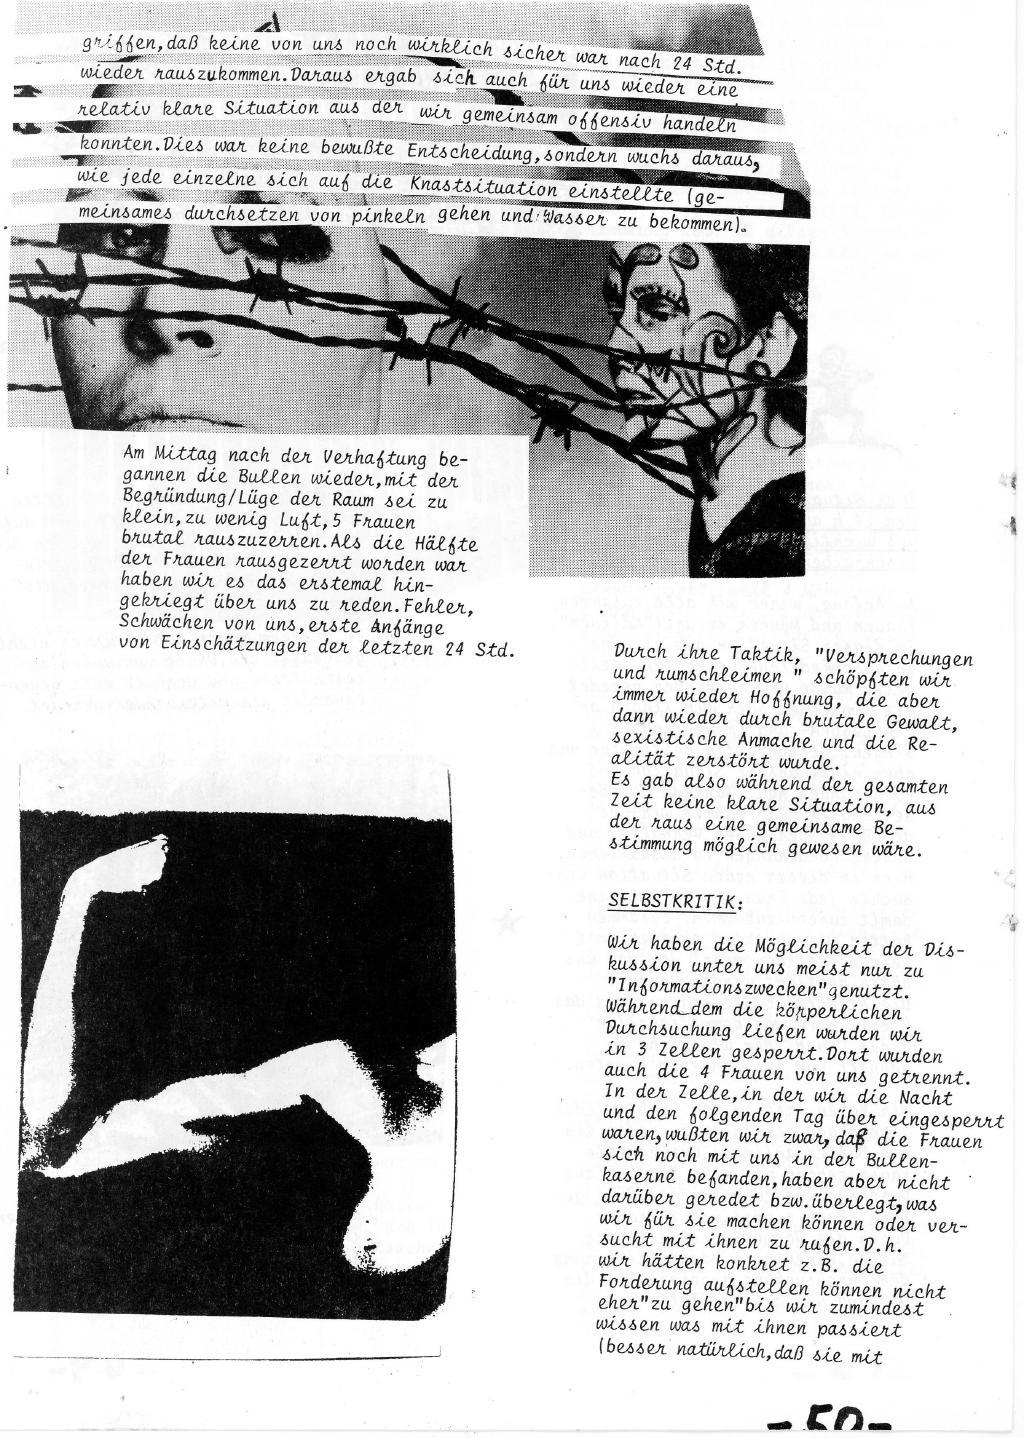 Belgien_Doku_Besetzung_EG_Kommission_1989_052